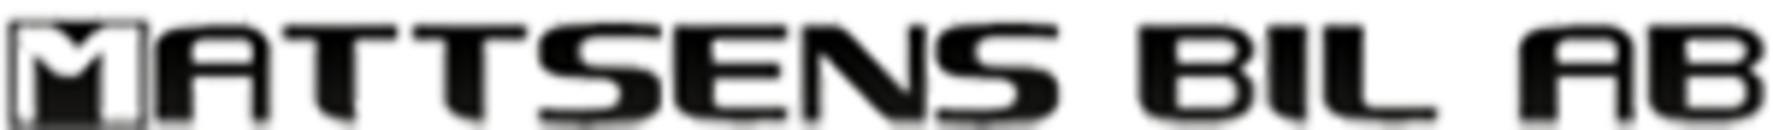 Mattsens Bil AB logo